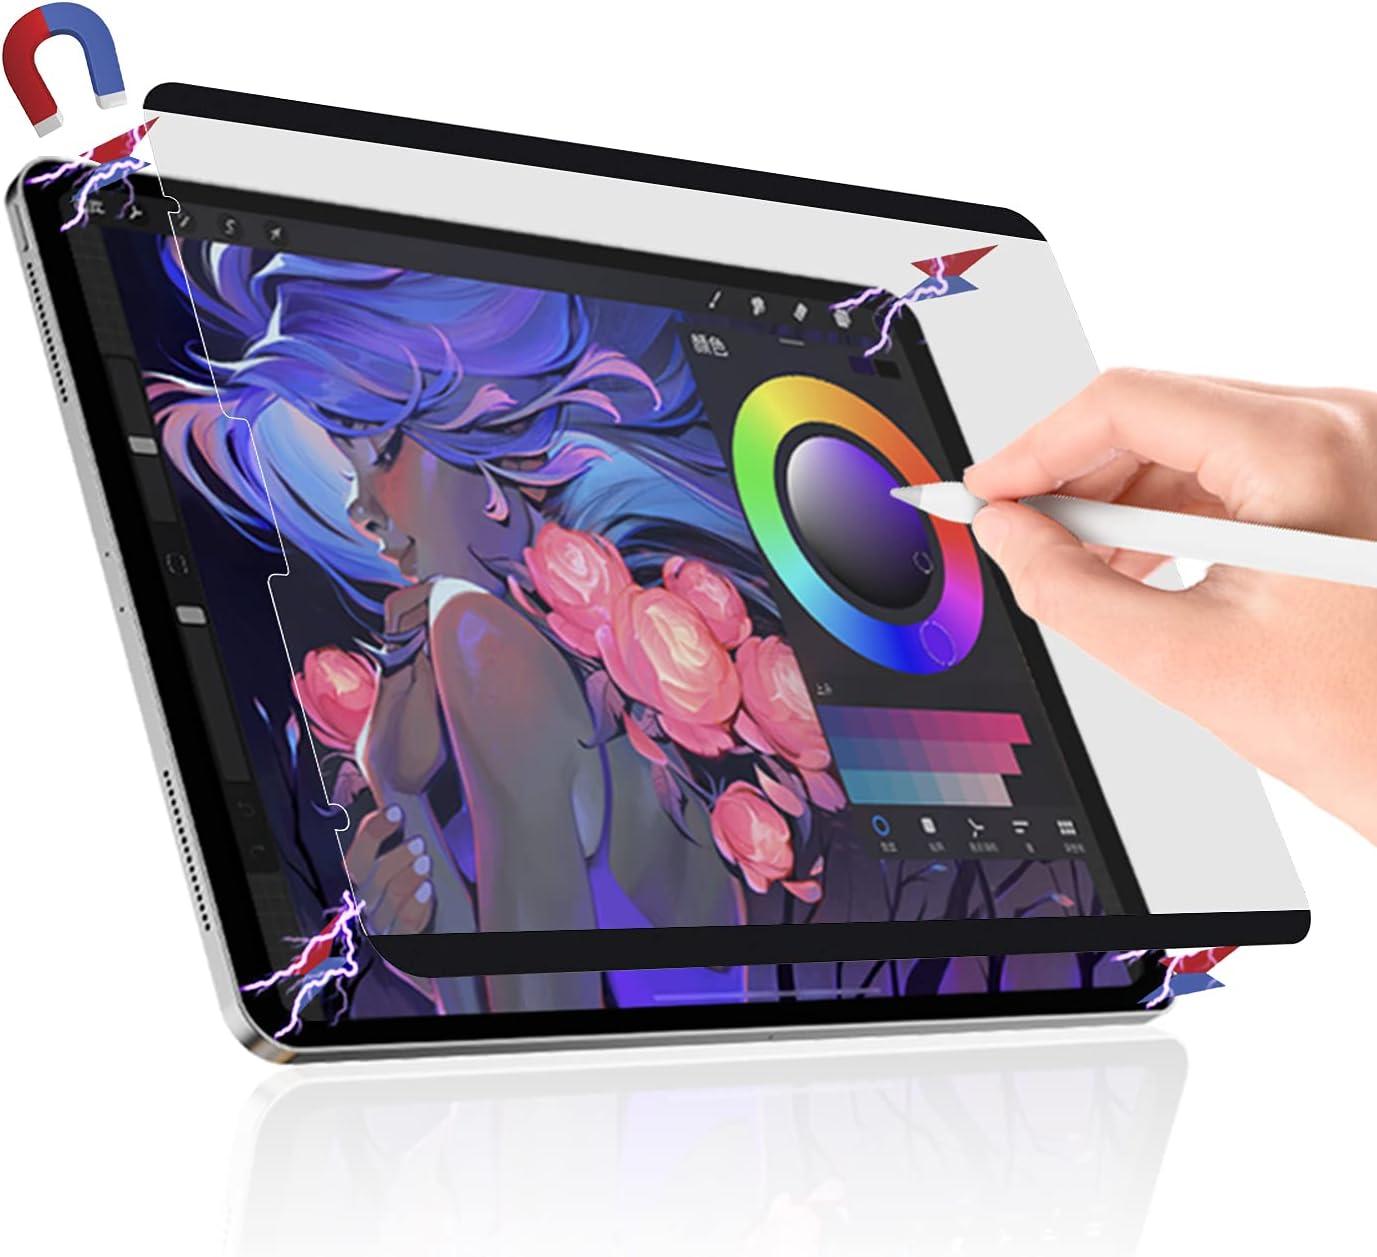 Feelpaper Omaha Mall Screen Protector Popular popular for iPad inch 10.5 10.2 Pro Air3